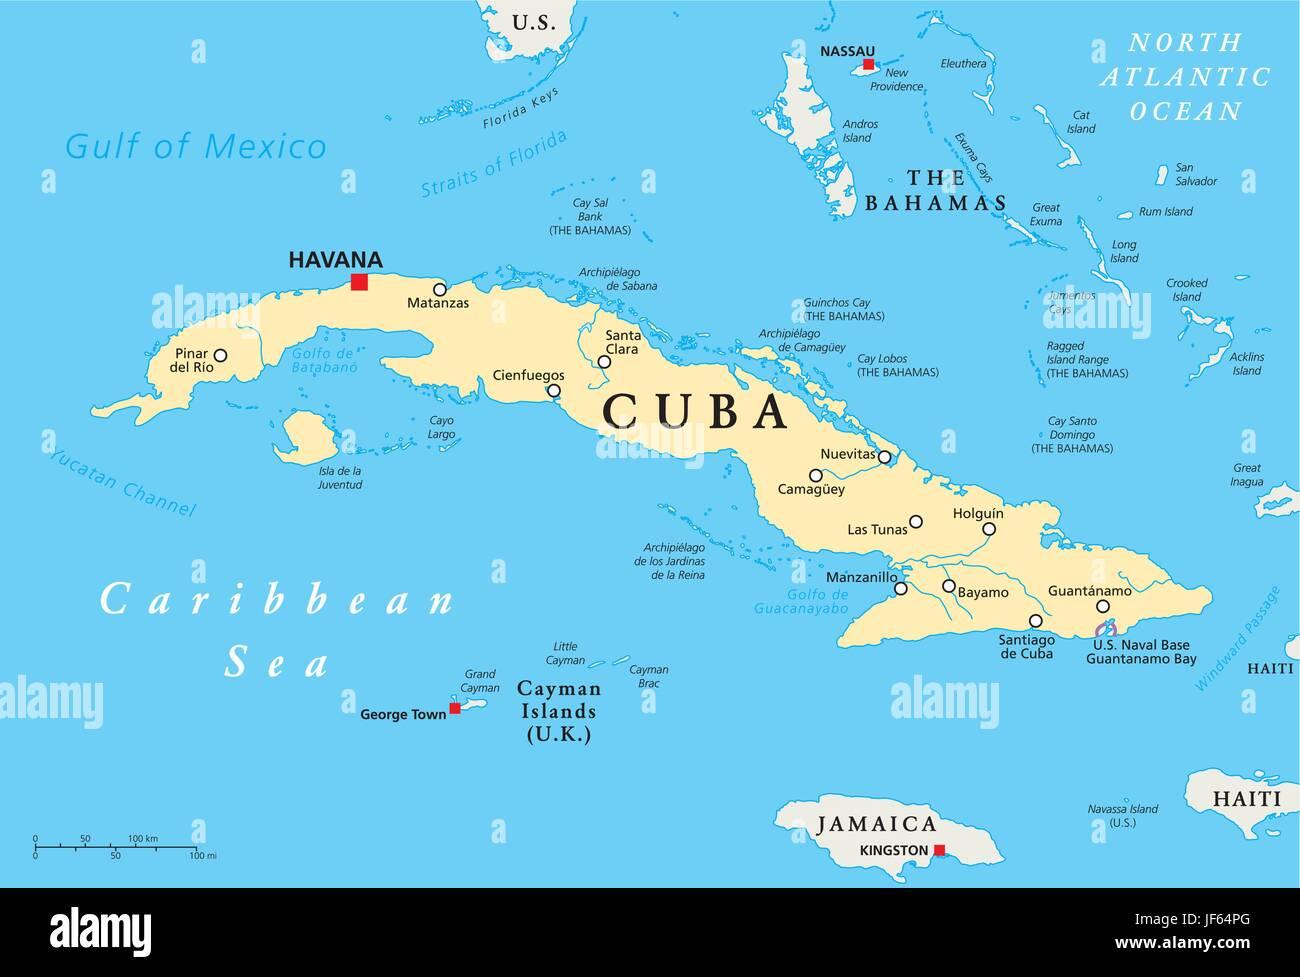 Cuba Mapa Del Mundo.Viajes Cuba La Habana Mapas Atlas Mapa Del Mundo Viajes Politica Imagen Vector De Stock Alamy